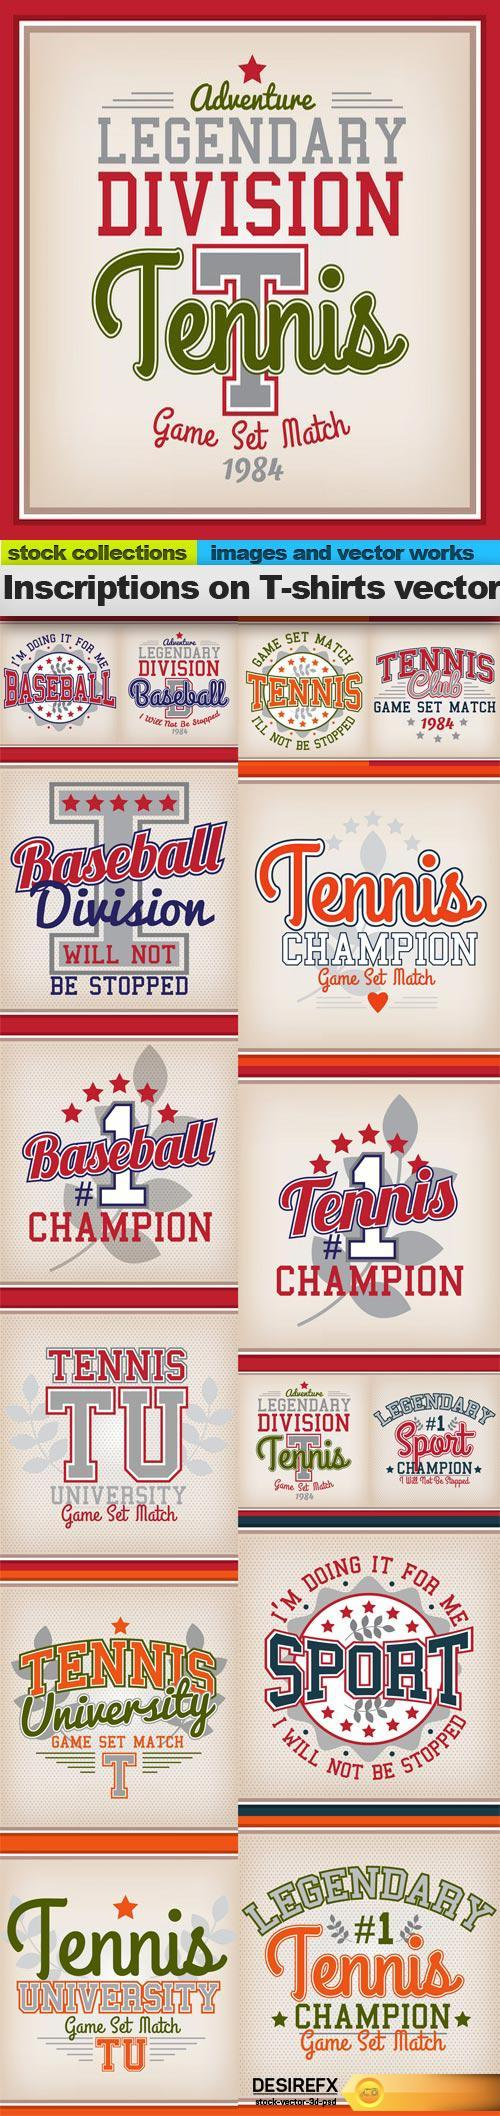 Shirt design eps - Inscriptions On T Shirts Vector 15 X Eps Http Www